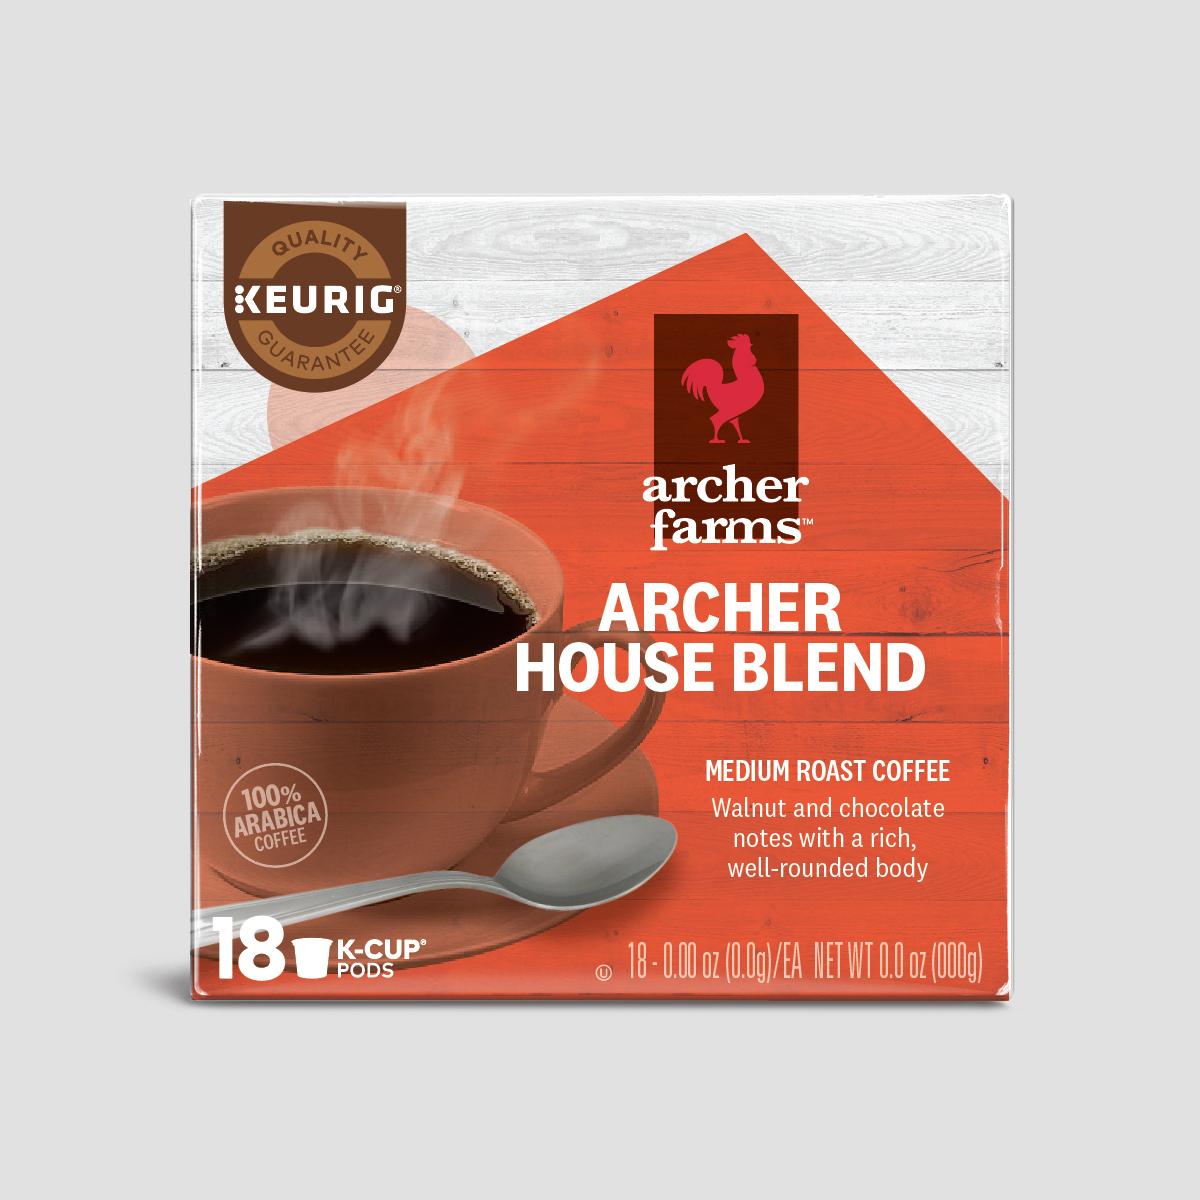 archer_pdp.jpg